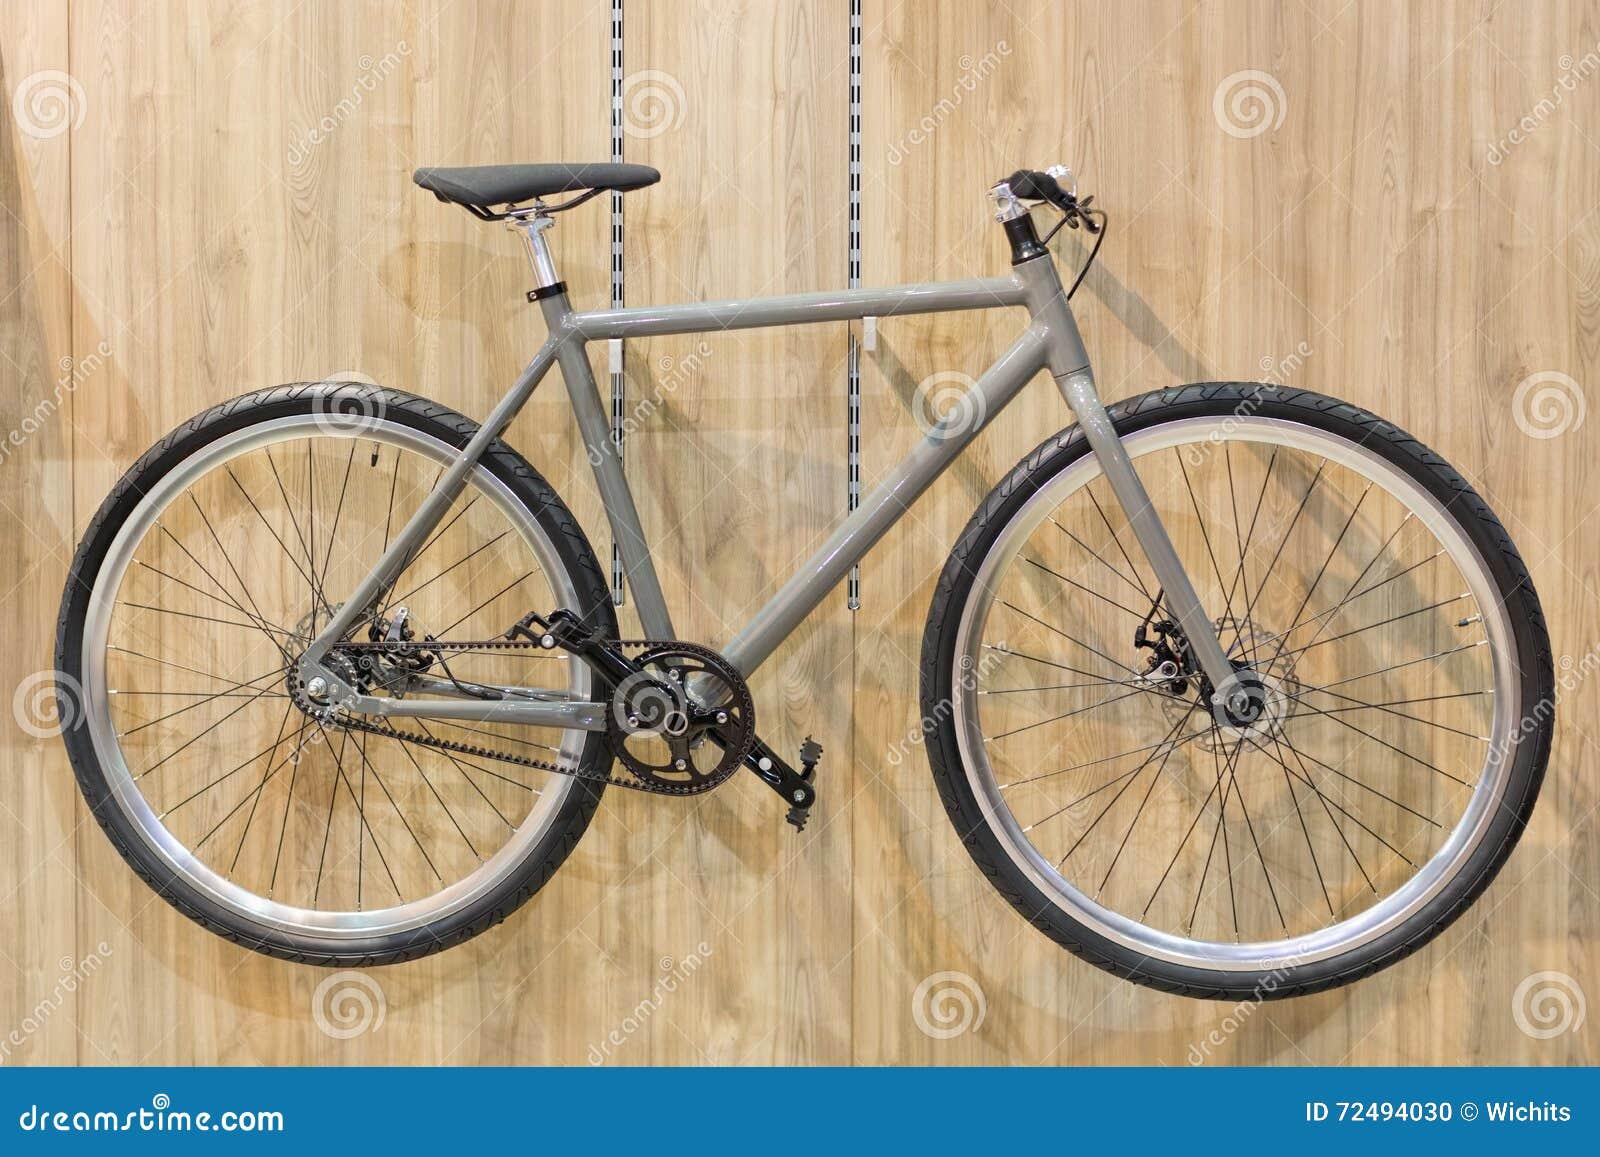 Fahrrad Gehangen An Wand Stockfoto Bild Von Erholung 72494030